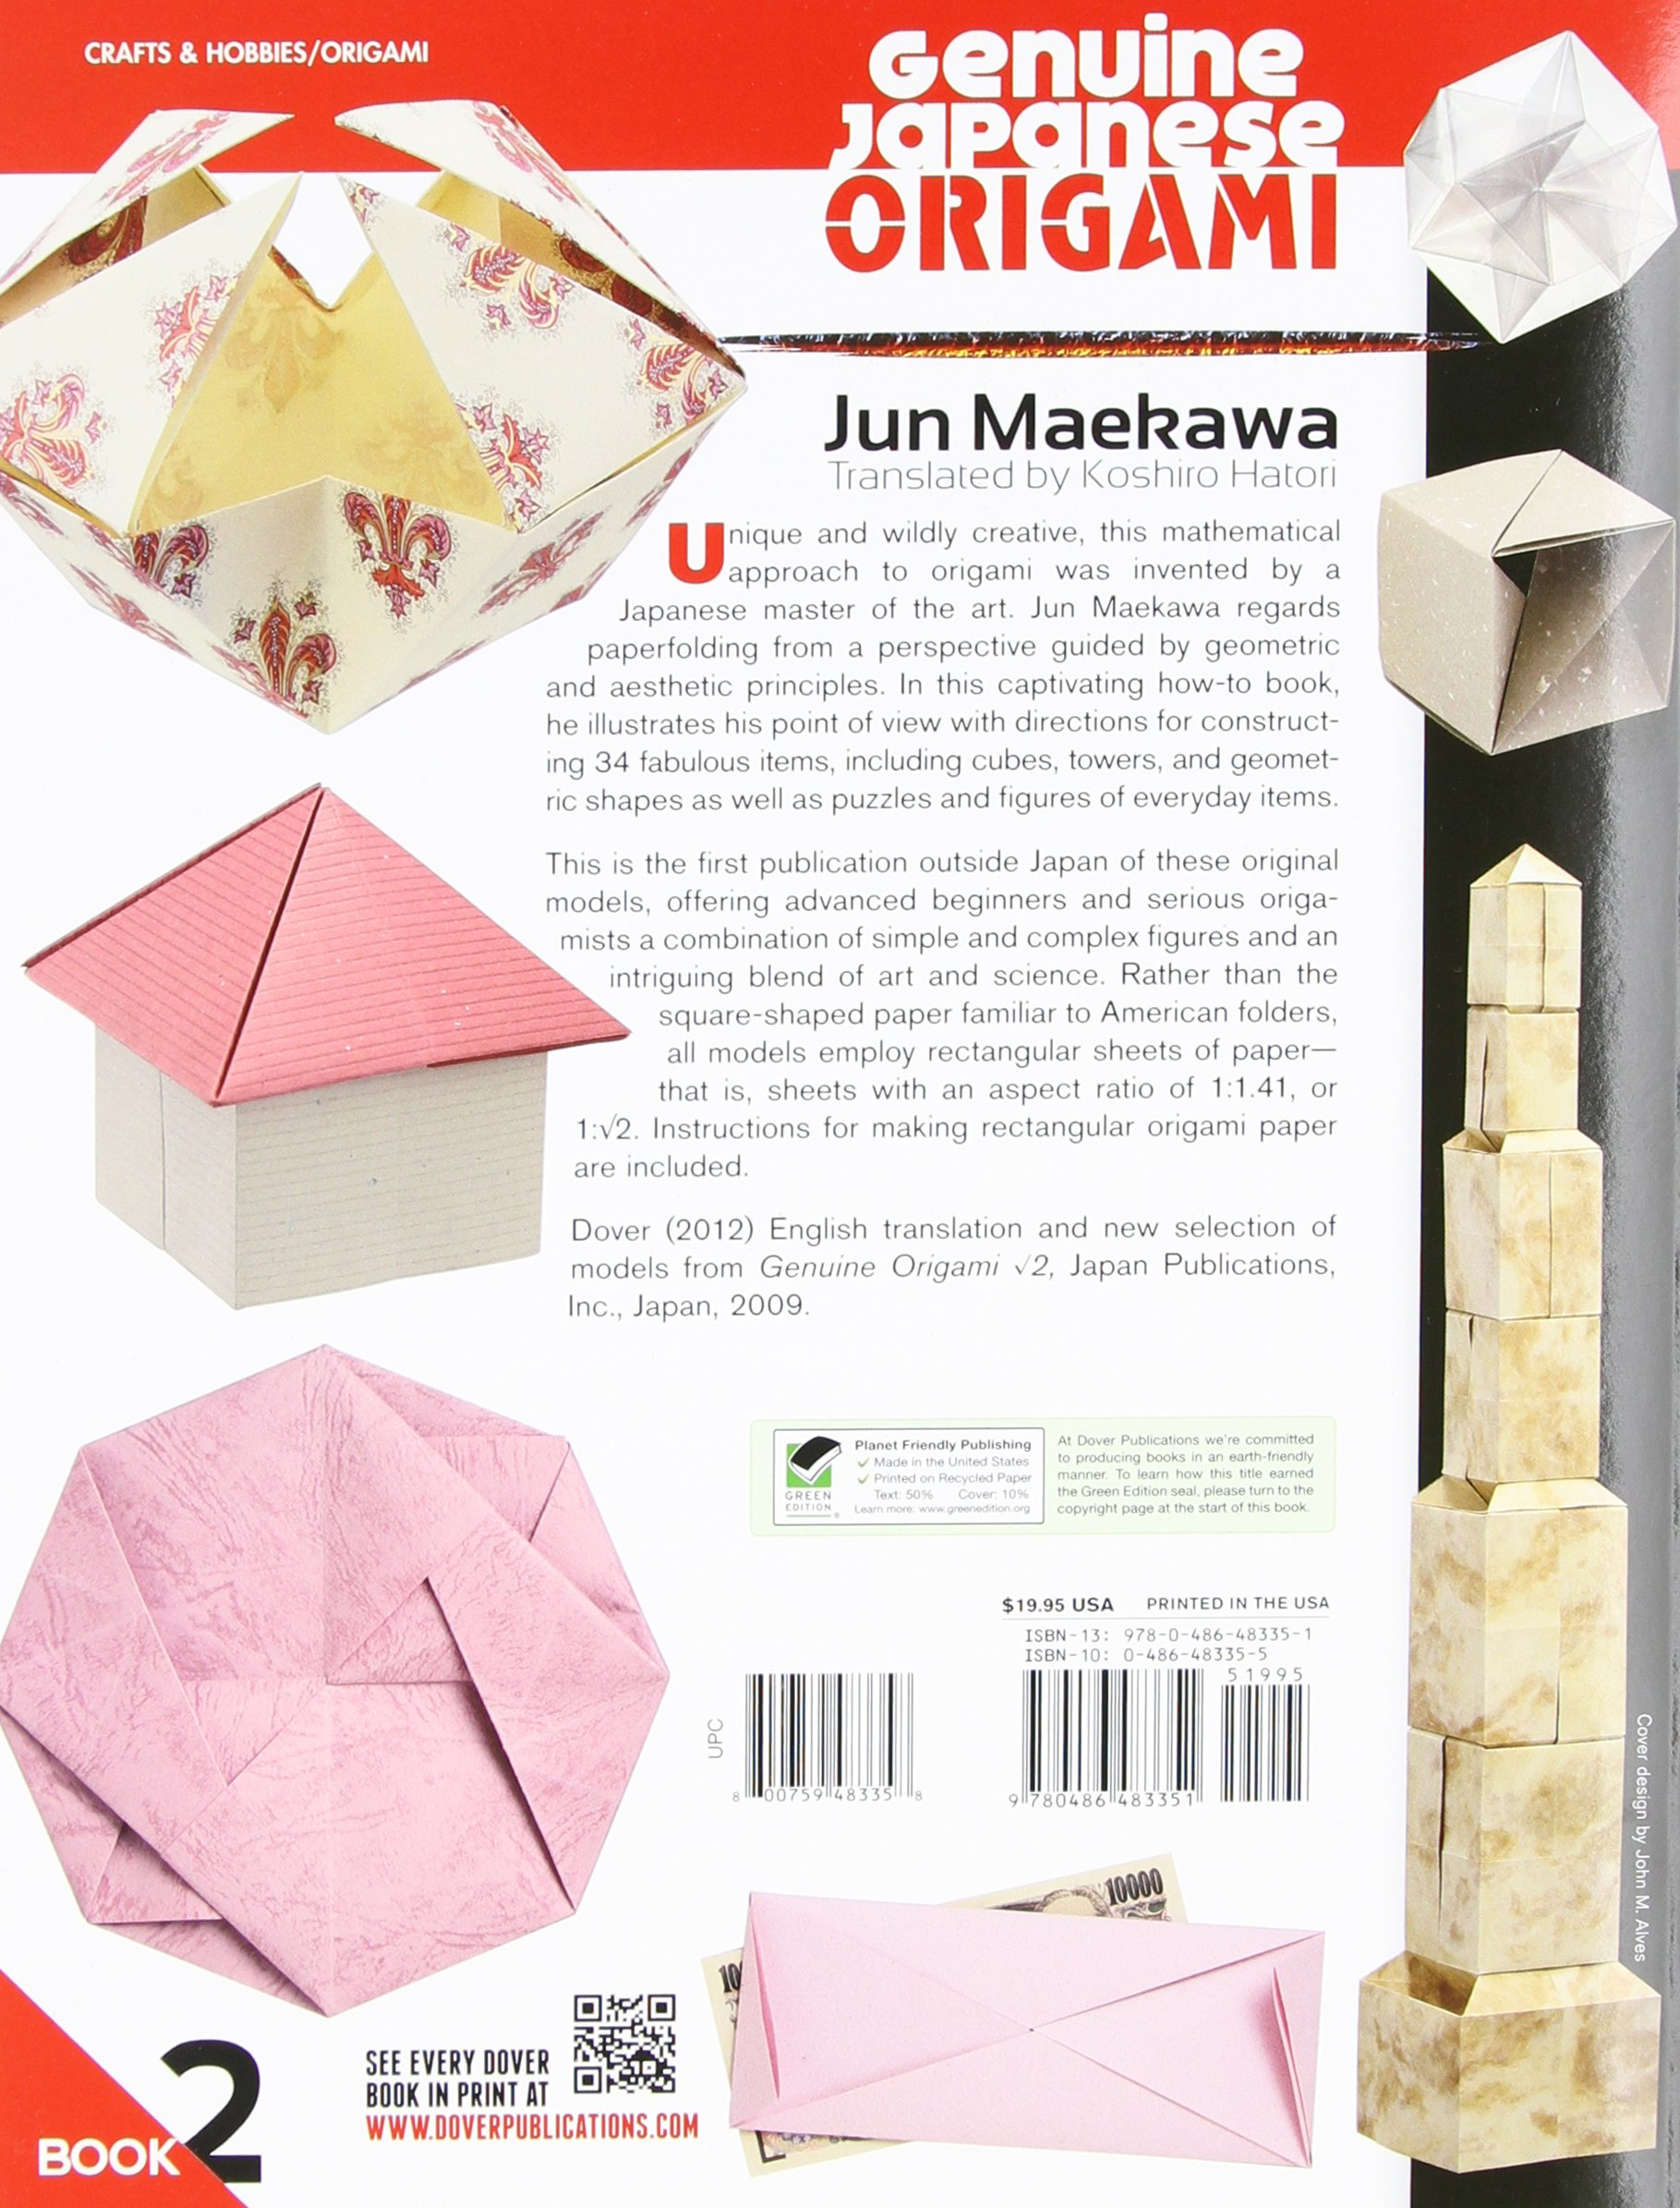 Genuine Japanese Origami Book 2 34 Mathematical Models Based Upon Central Lookup Model Diagrams Stepbystep The Square Root Of Dover Papercraft Jun Maekawa Koshiro Hatori